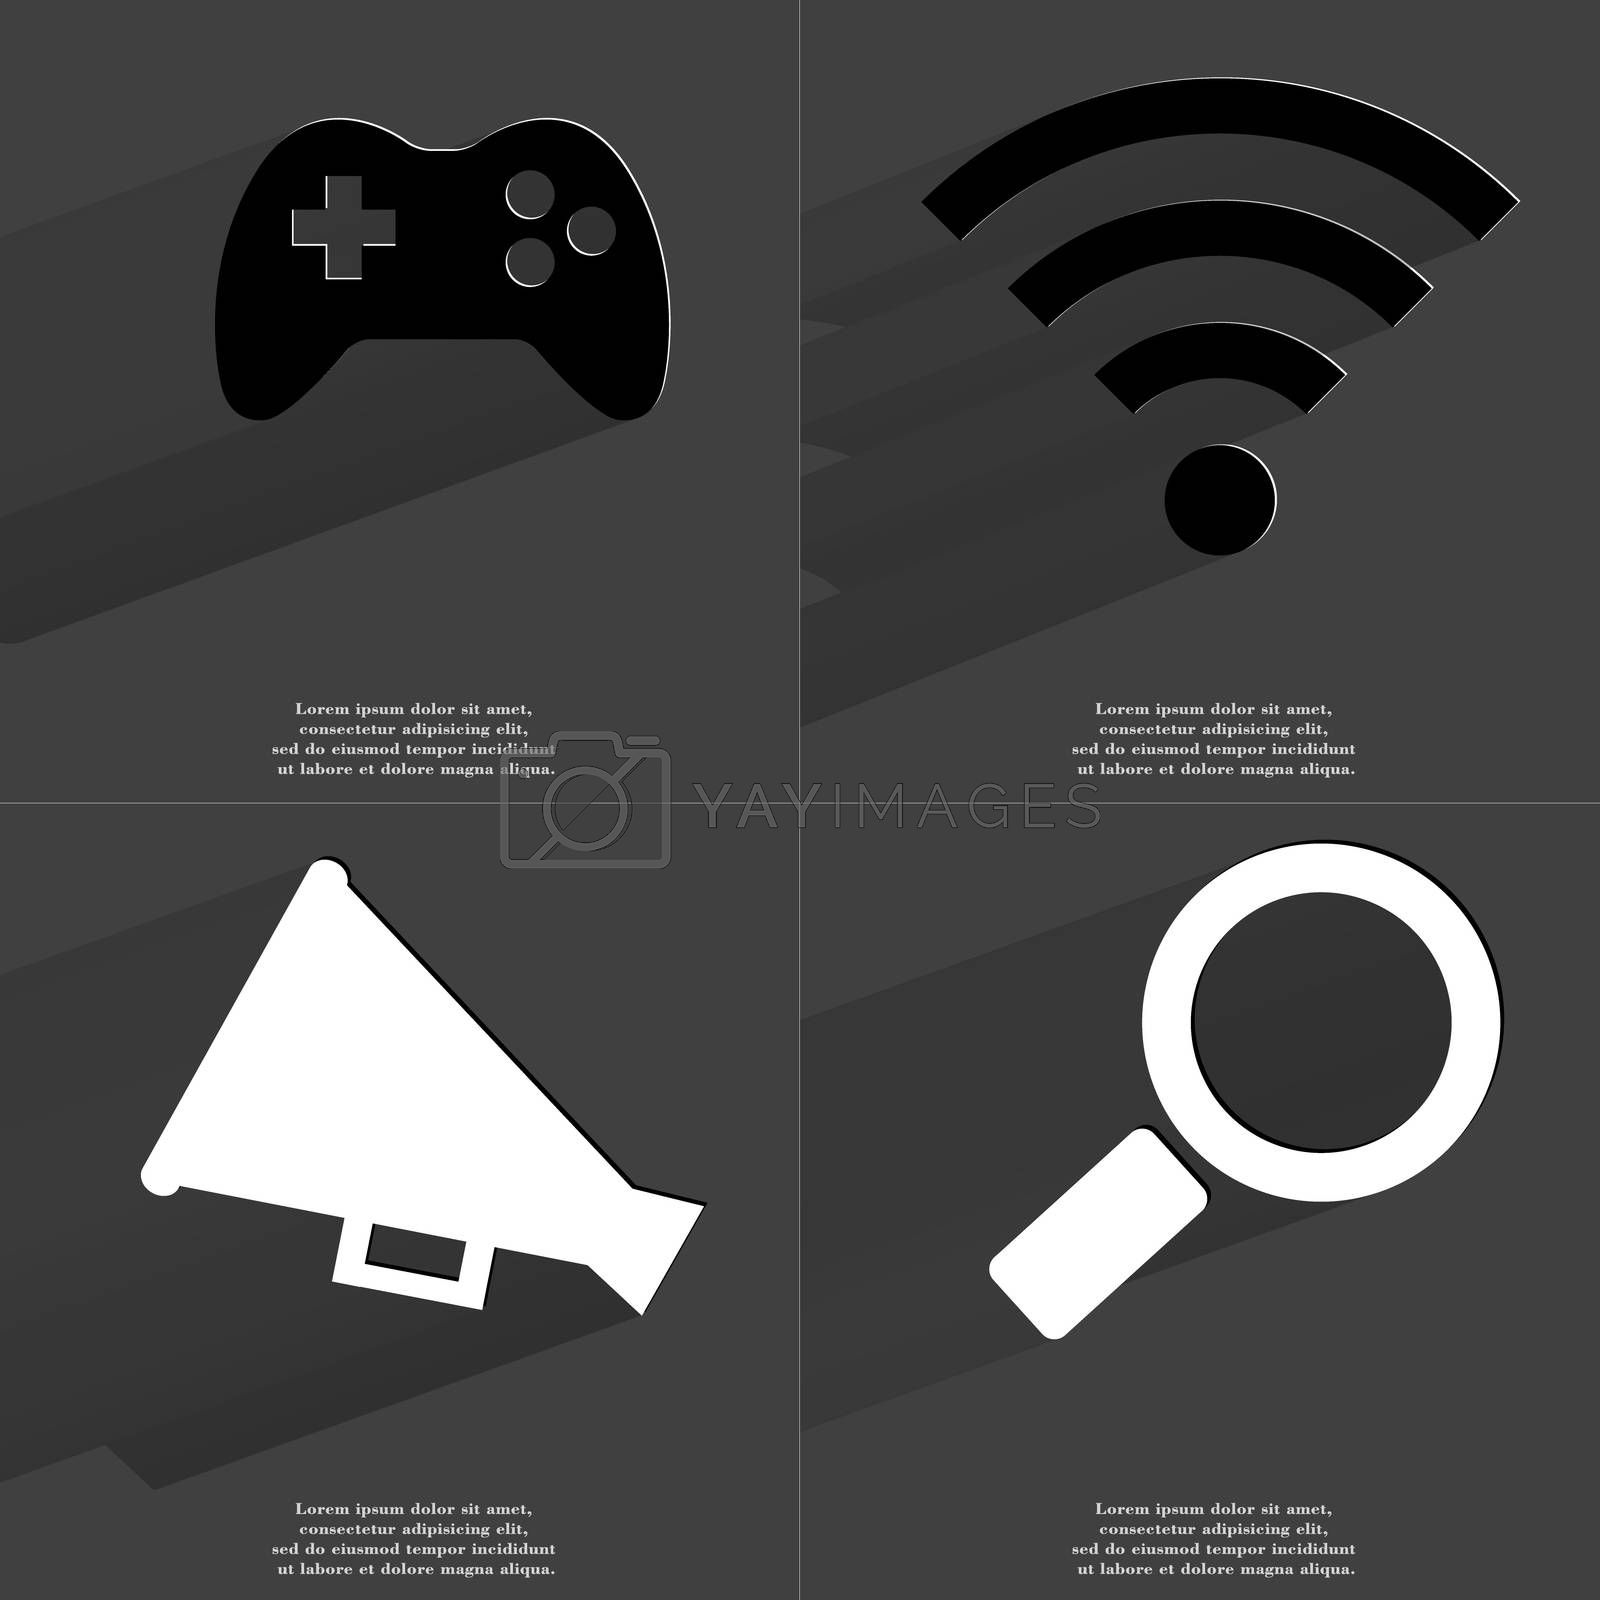 Royalty free image of Gamepad, WLAN icon, Megaphone, Magnifying glass. Symbols with long shadow. Flat design by serhii_lohvyniuk